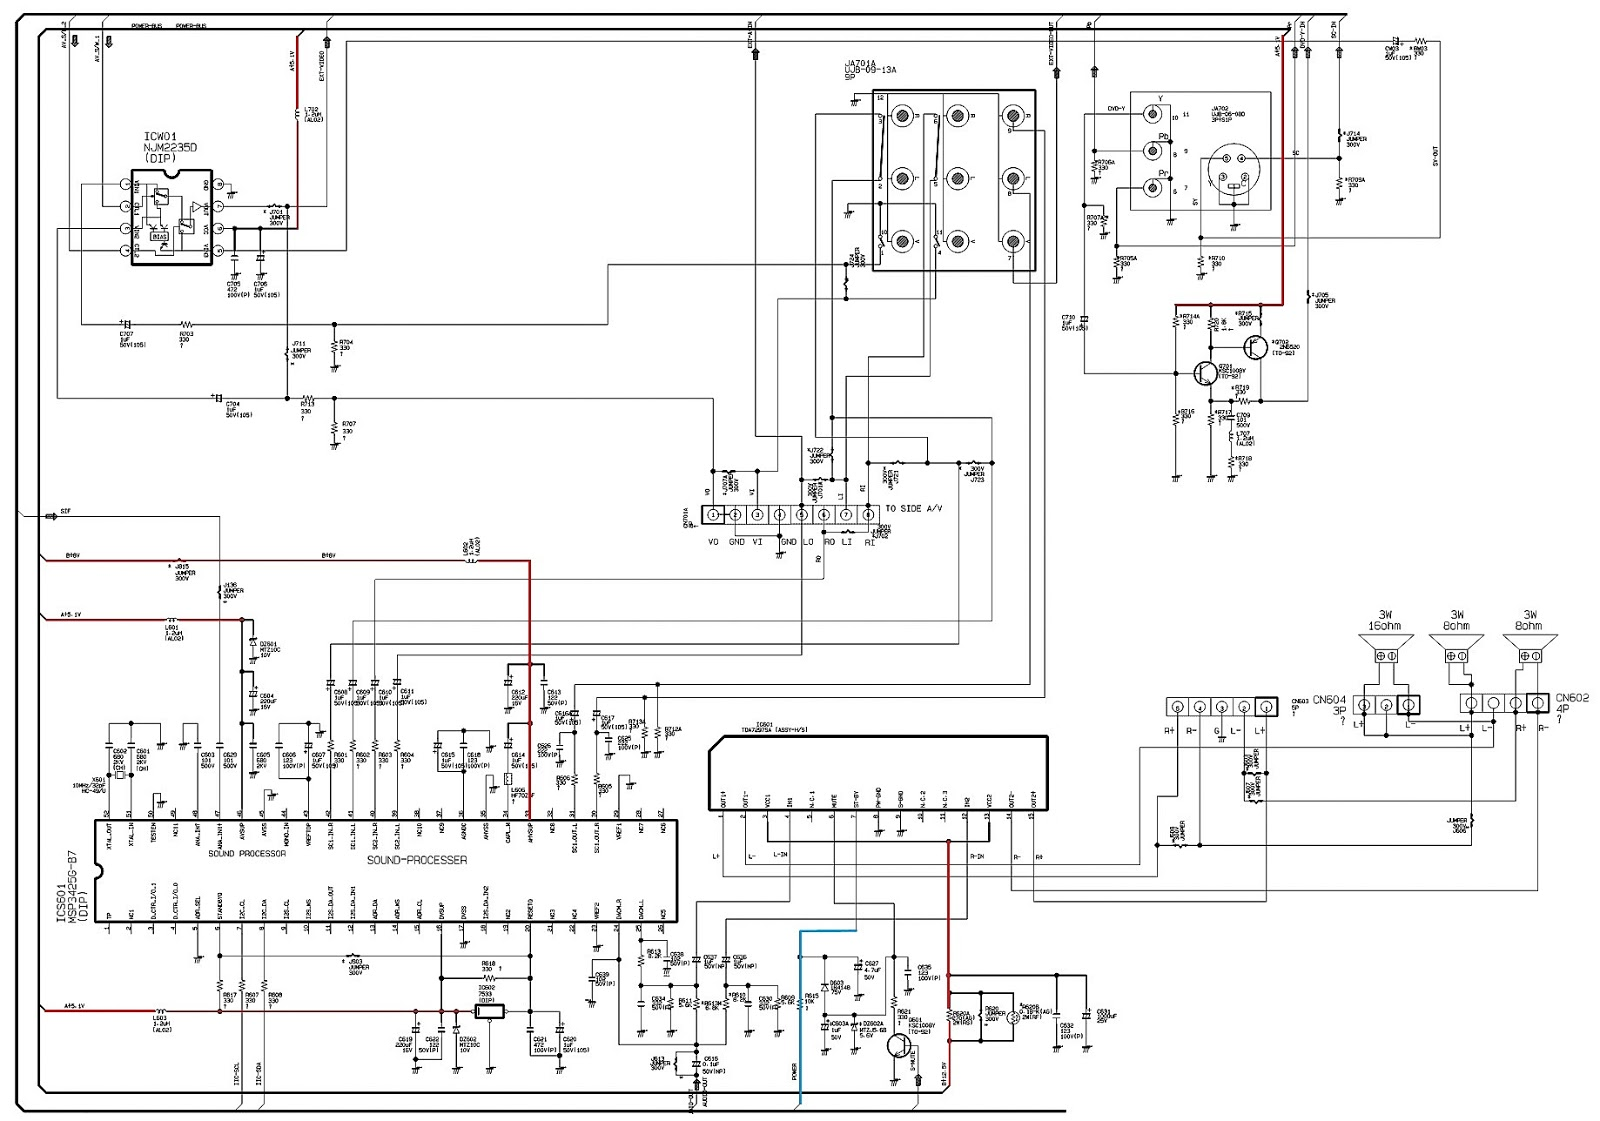 crt monitor pcb diagram